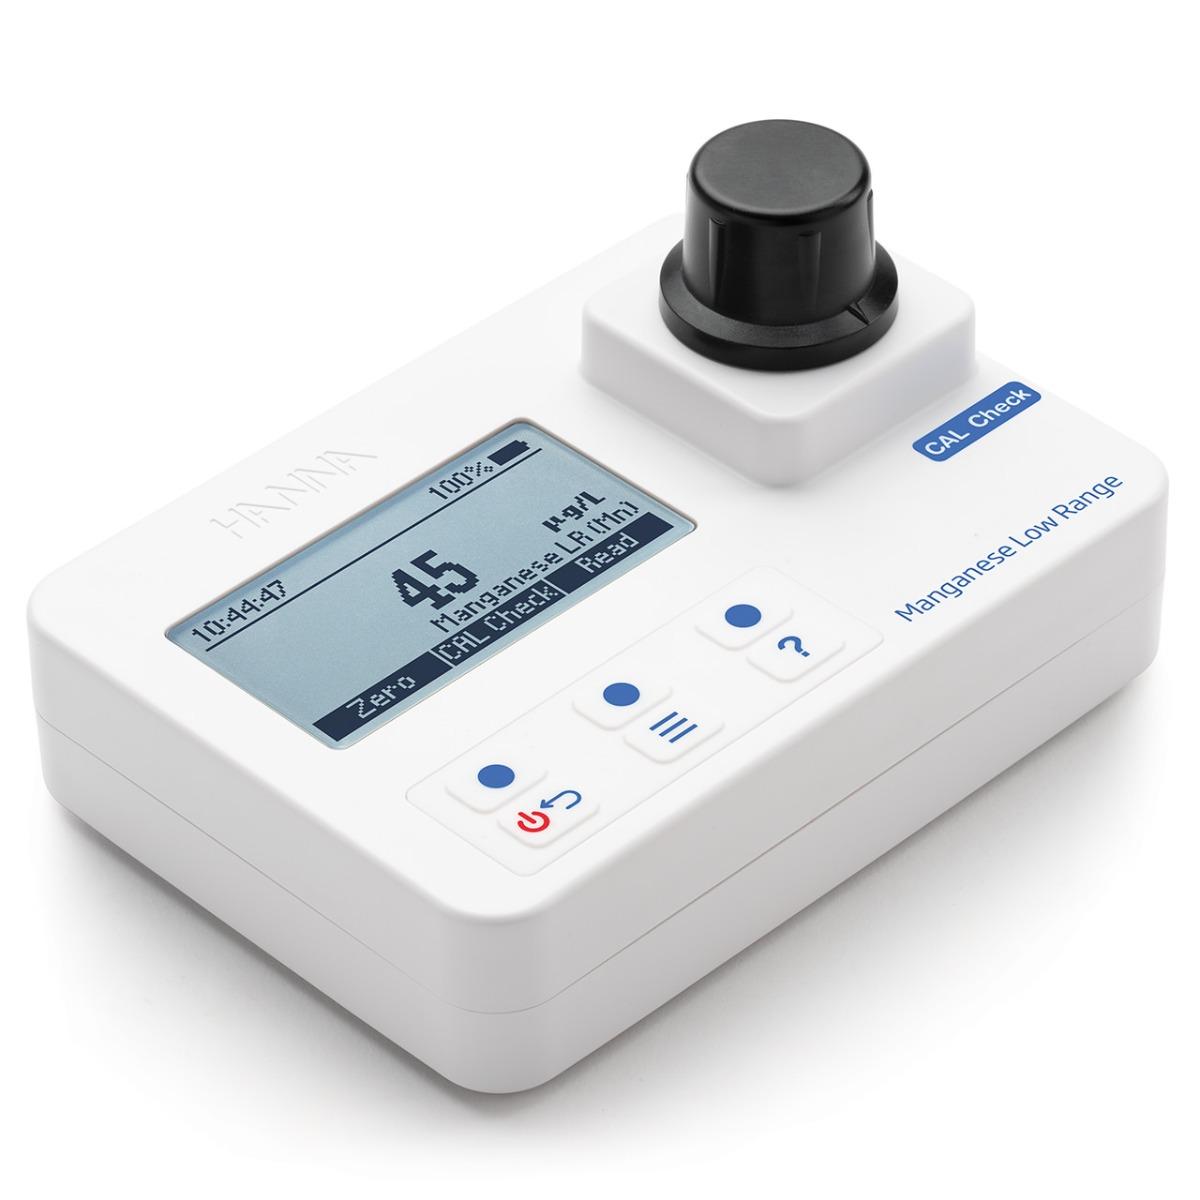 Manganese (scala bassa) – Fotometro portatile con CAL Check – HI97748